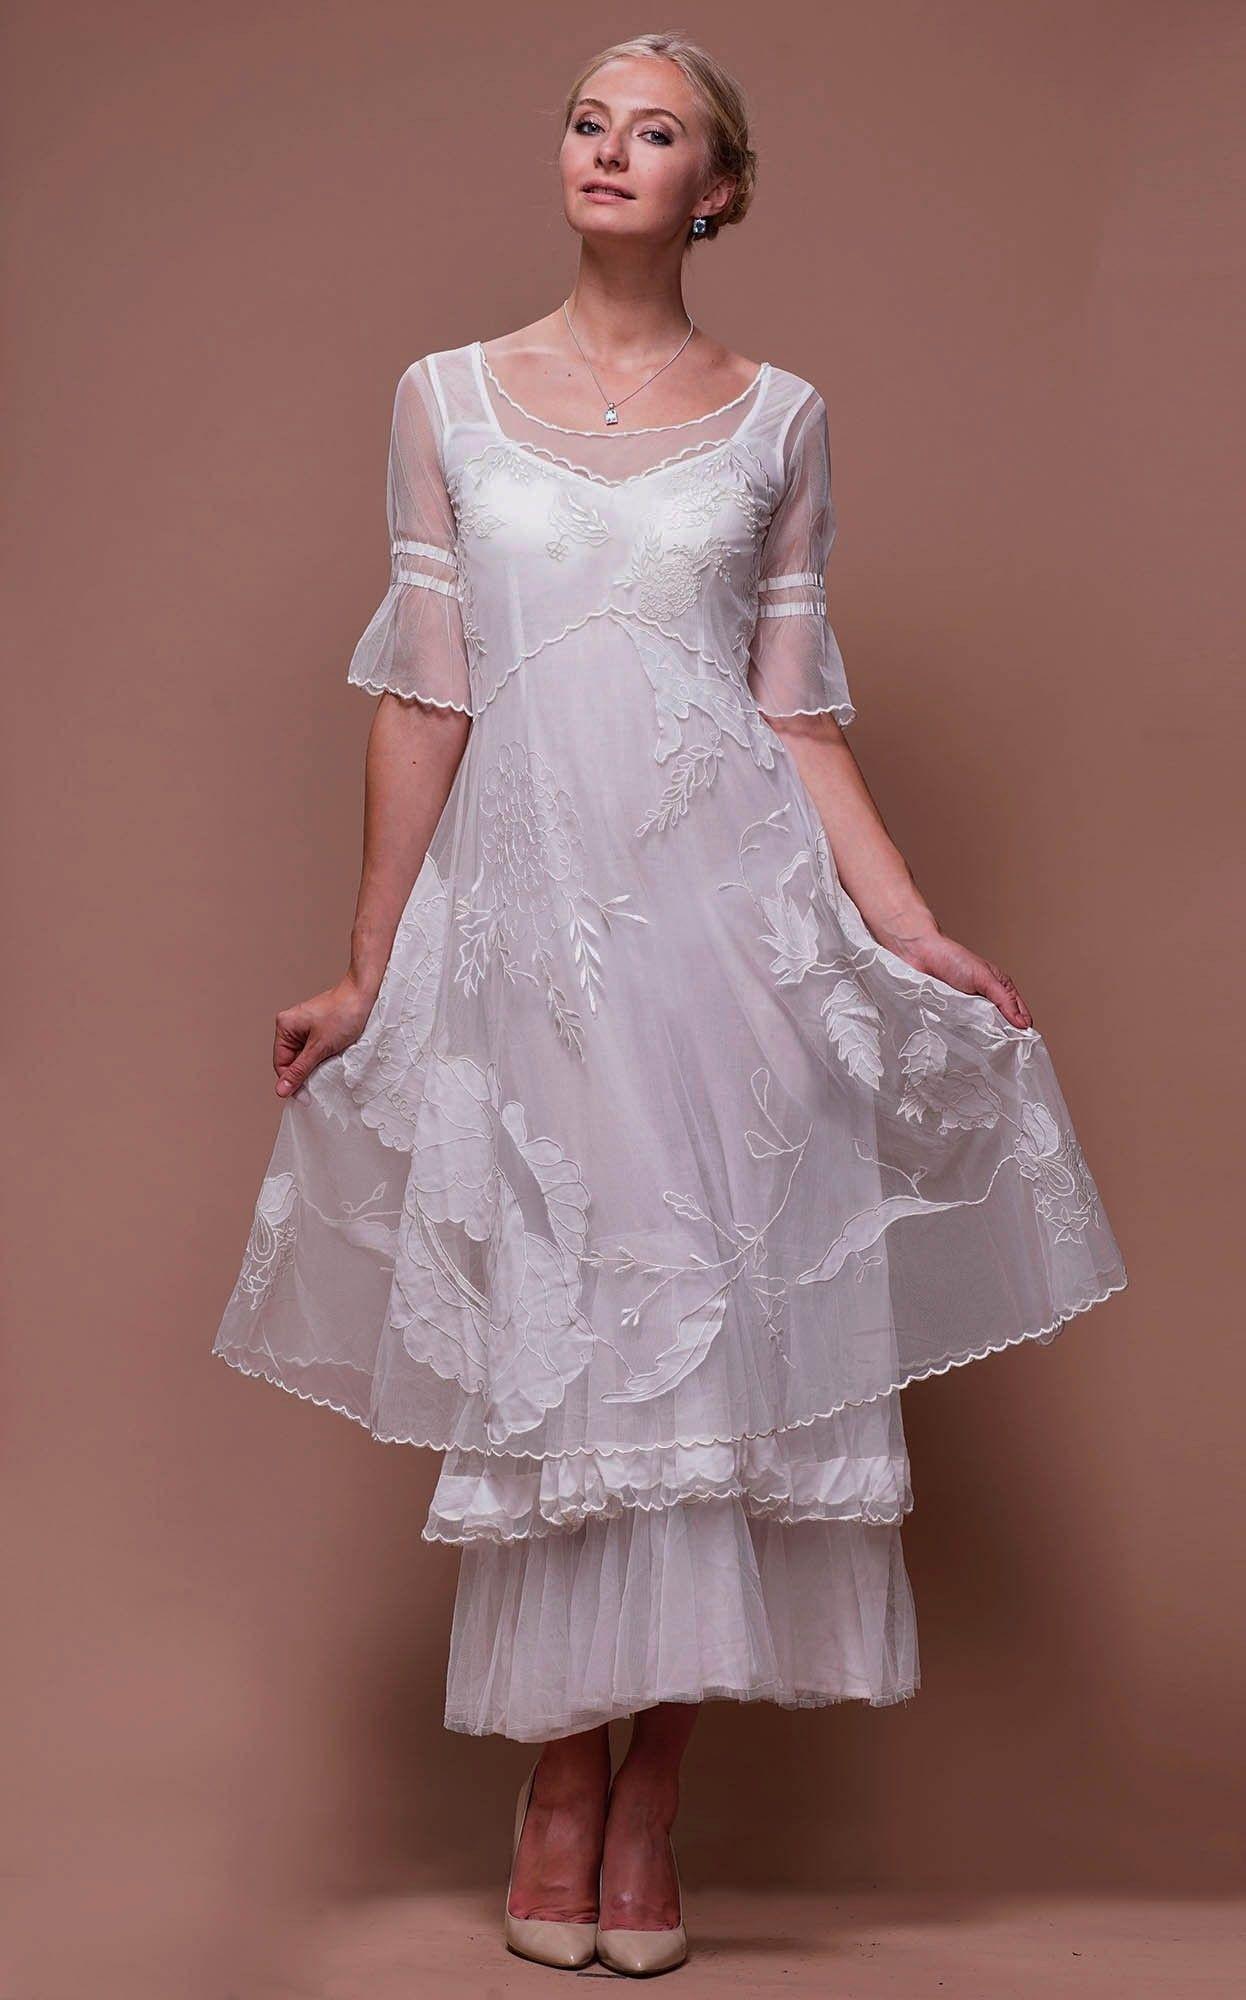 Titanic Tiered Vintage Wedding Dress In Ivory By Nataya